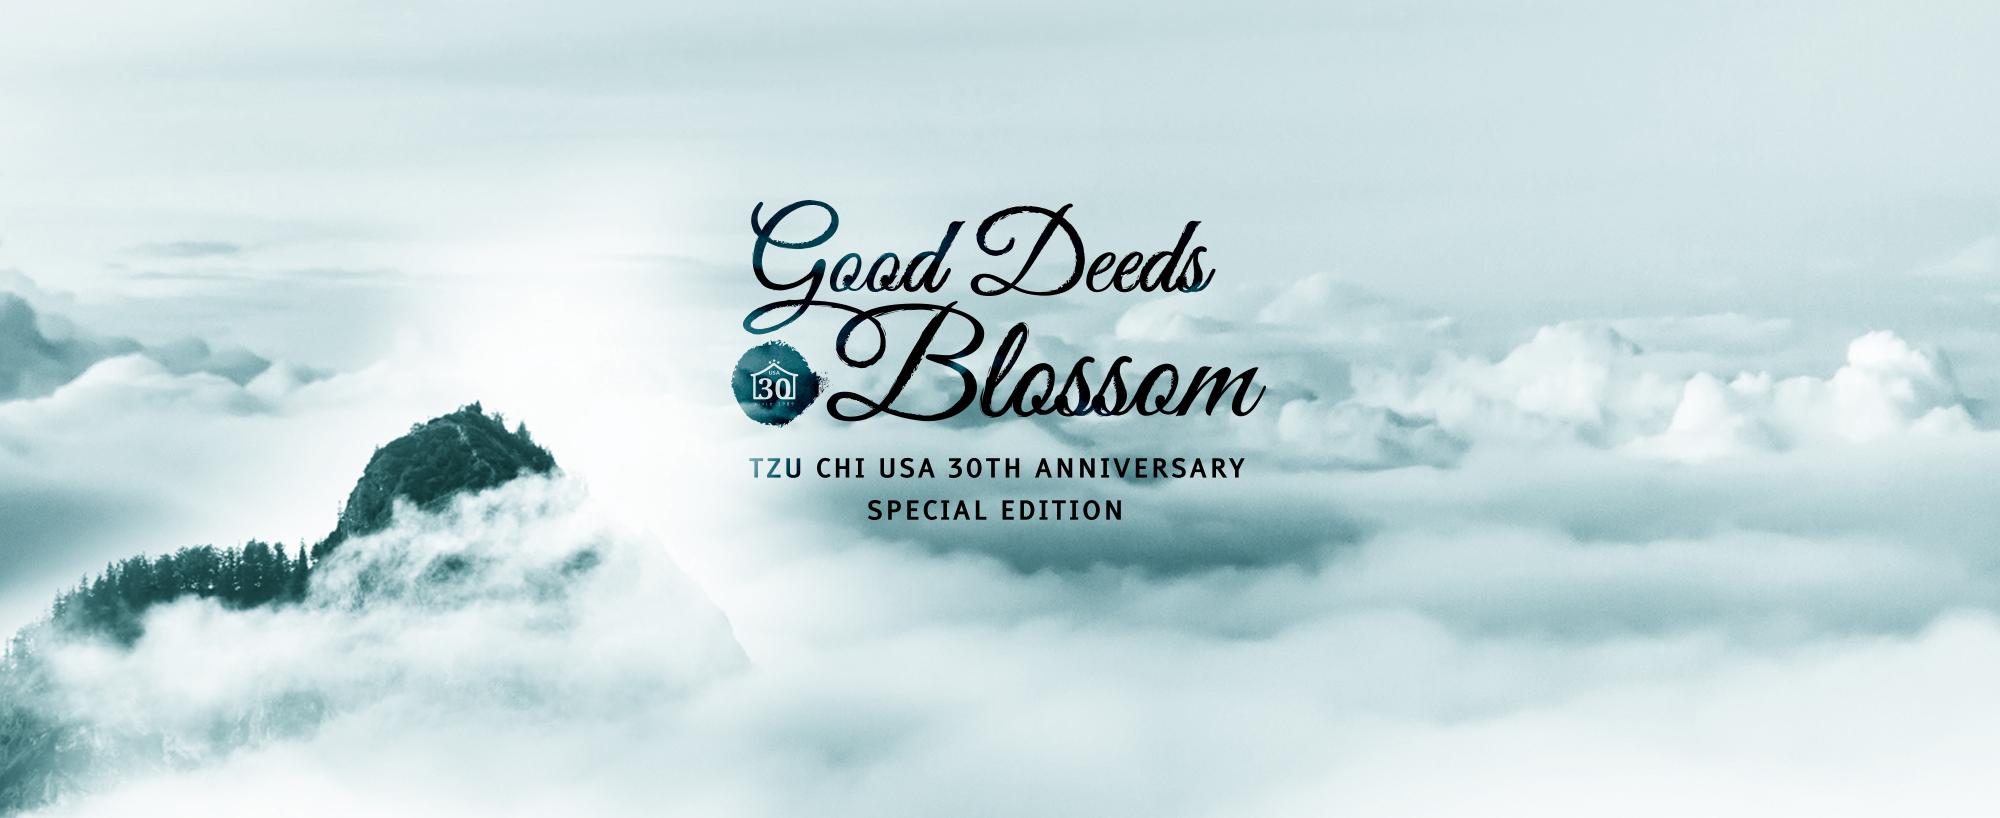 good-deed-blossom-web-hero-image_2000x974_EN-v2